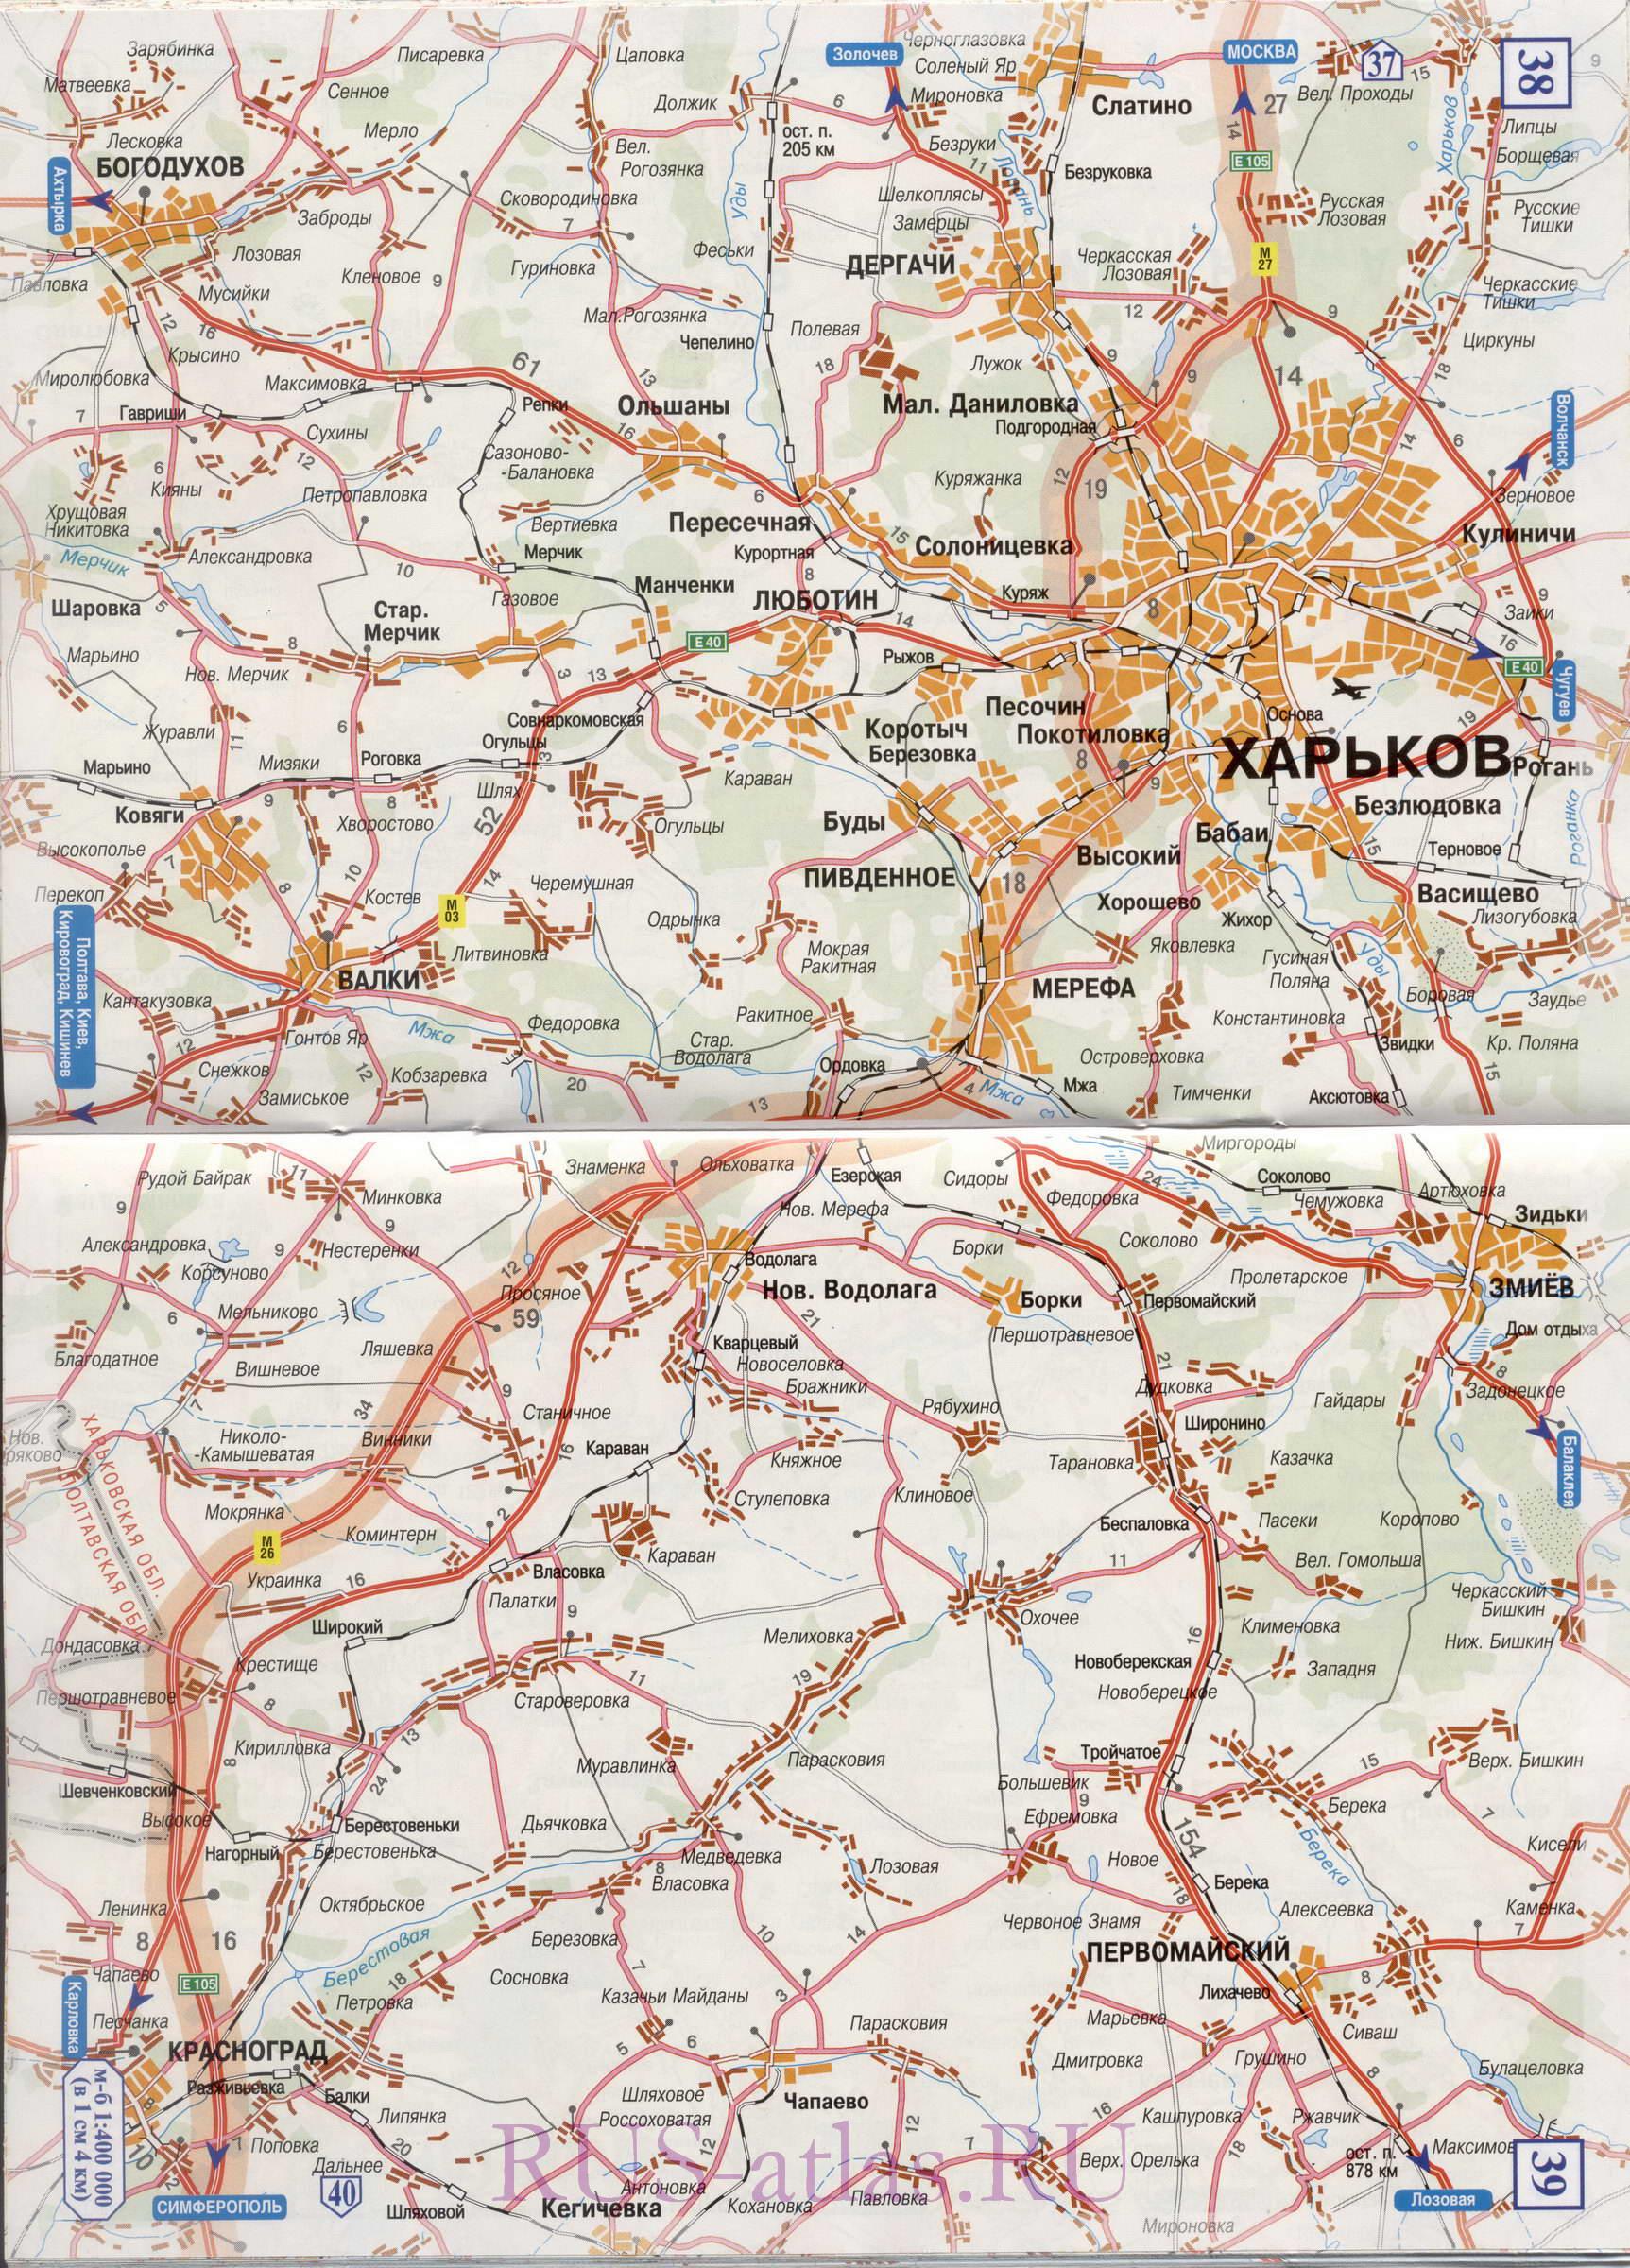 Подробная карта трассы м2 от харькова